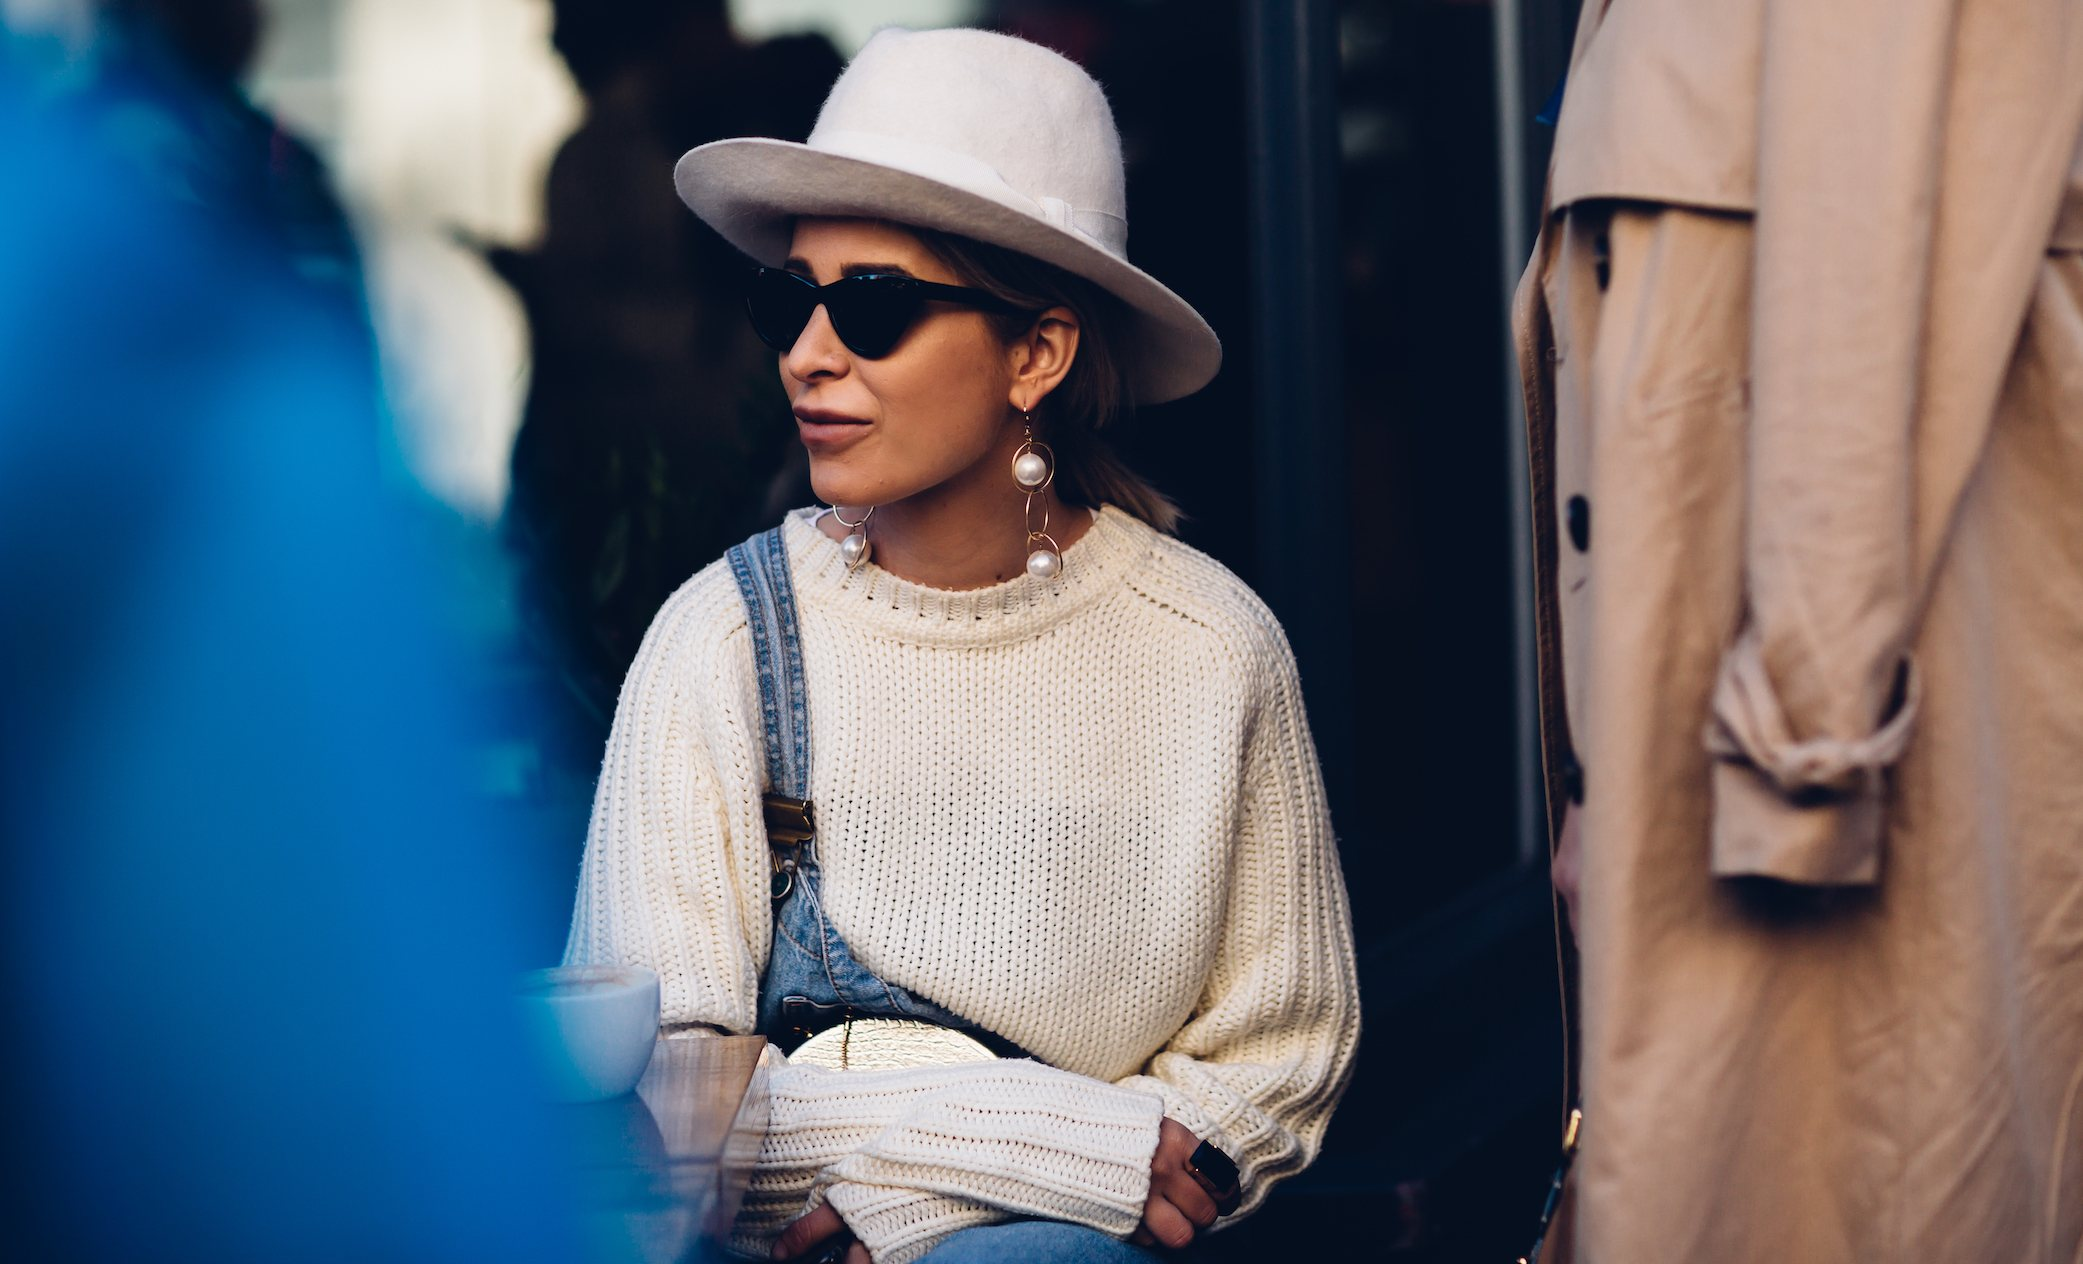 pearlearring woman profile jewellery streetsphoto